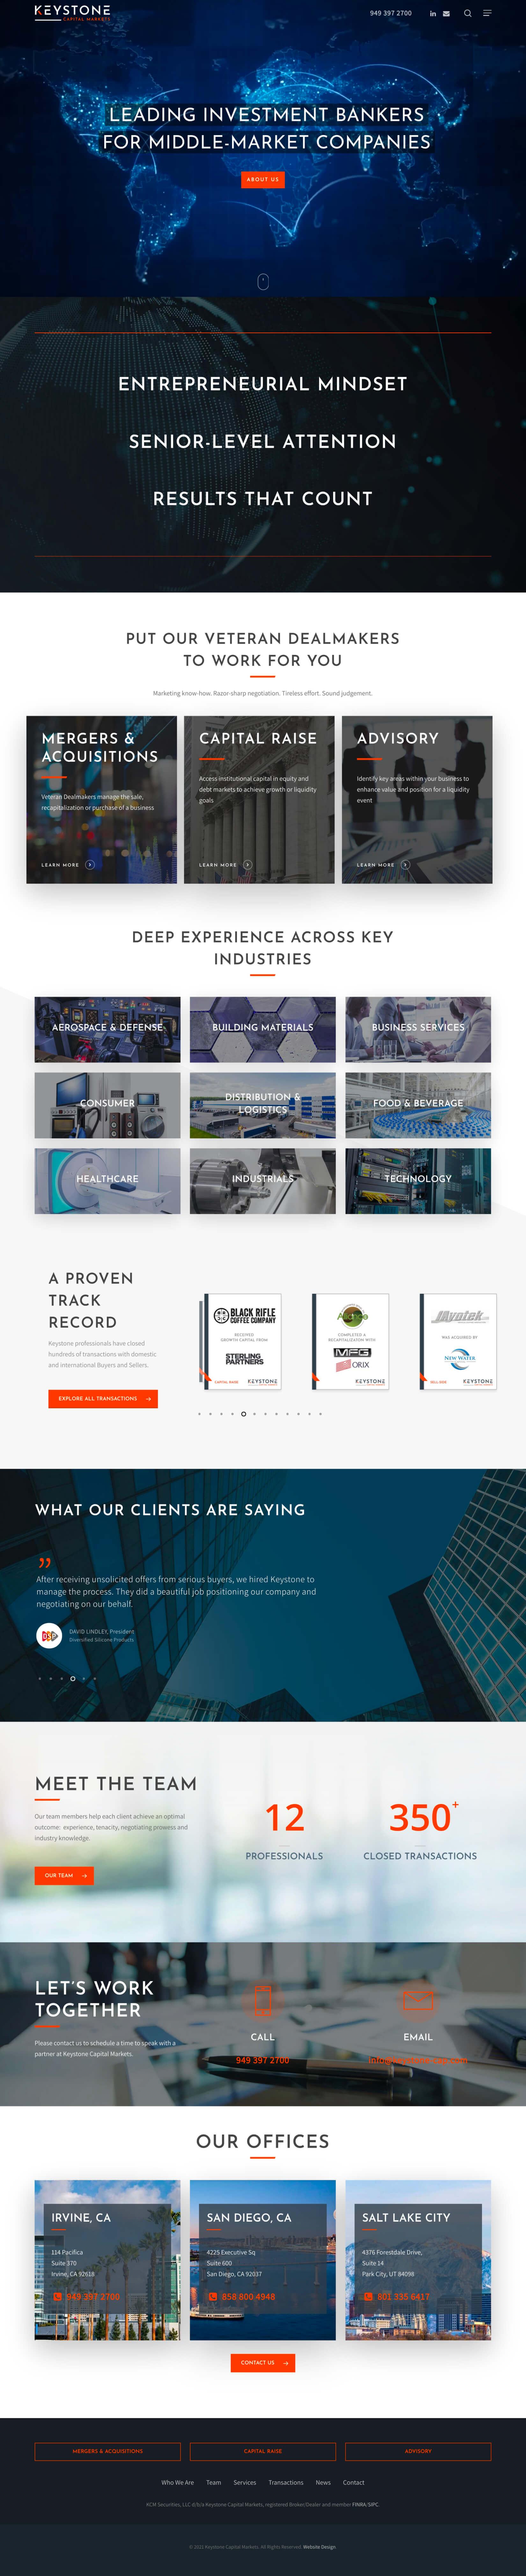 keystone website design mockup homepage 1 1